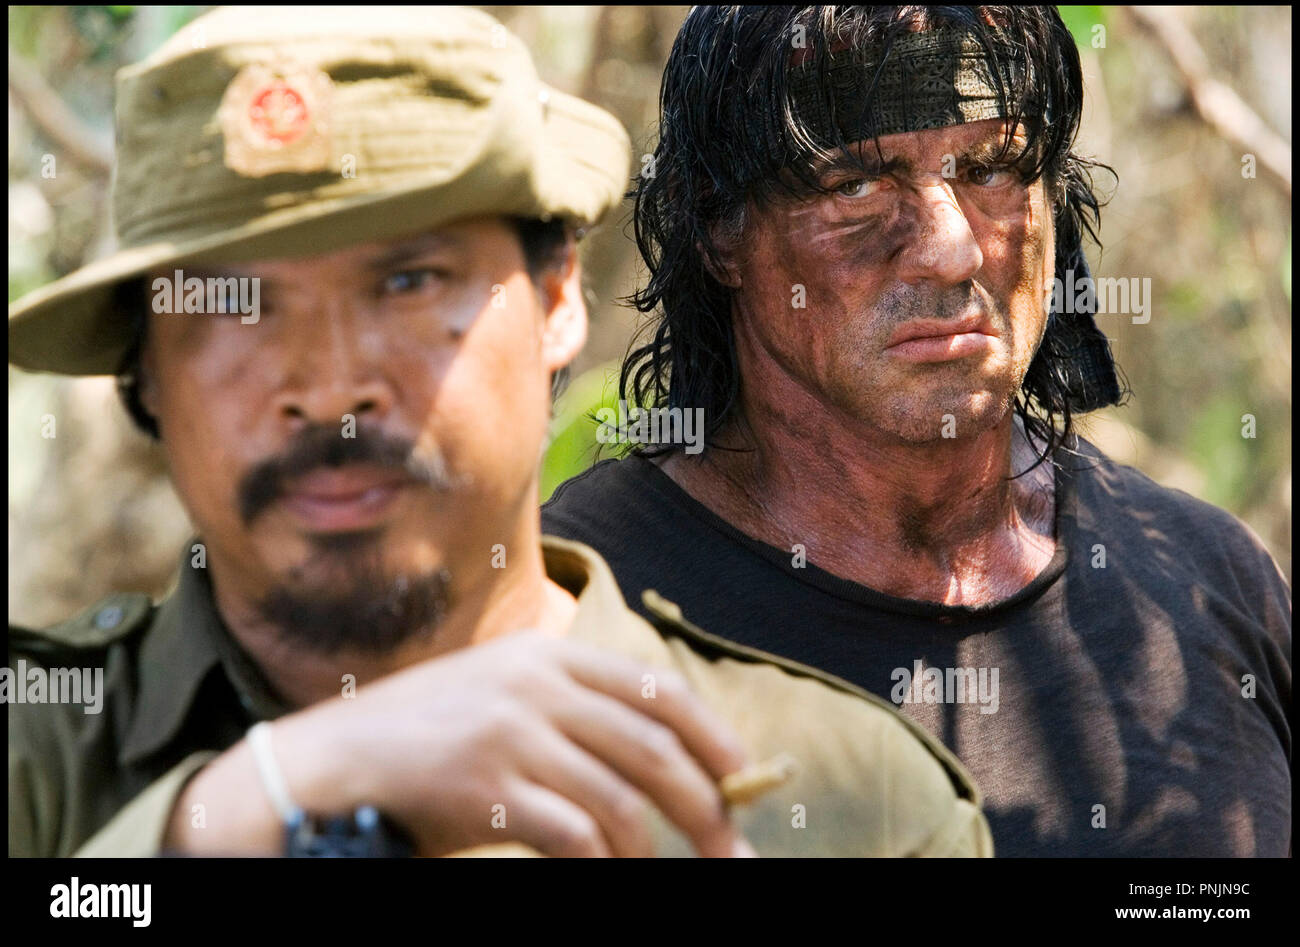 Rambo Iv Stock Photos & Rambo Iv Stock Images - Alamy